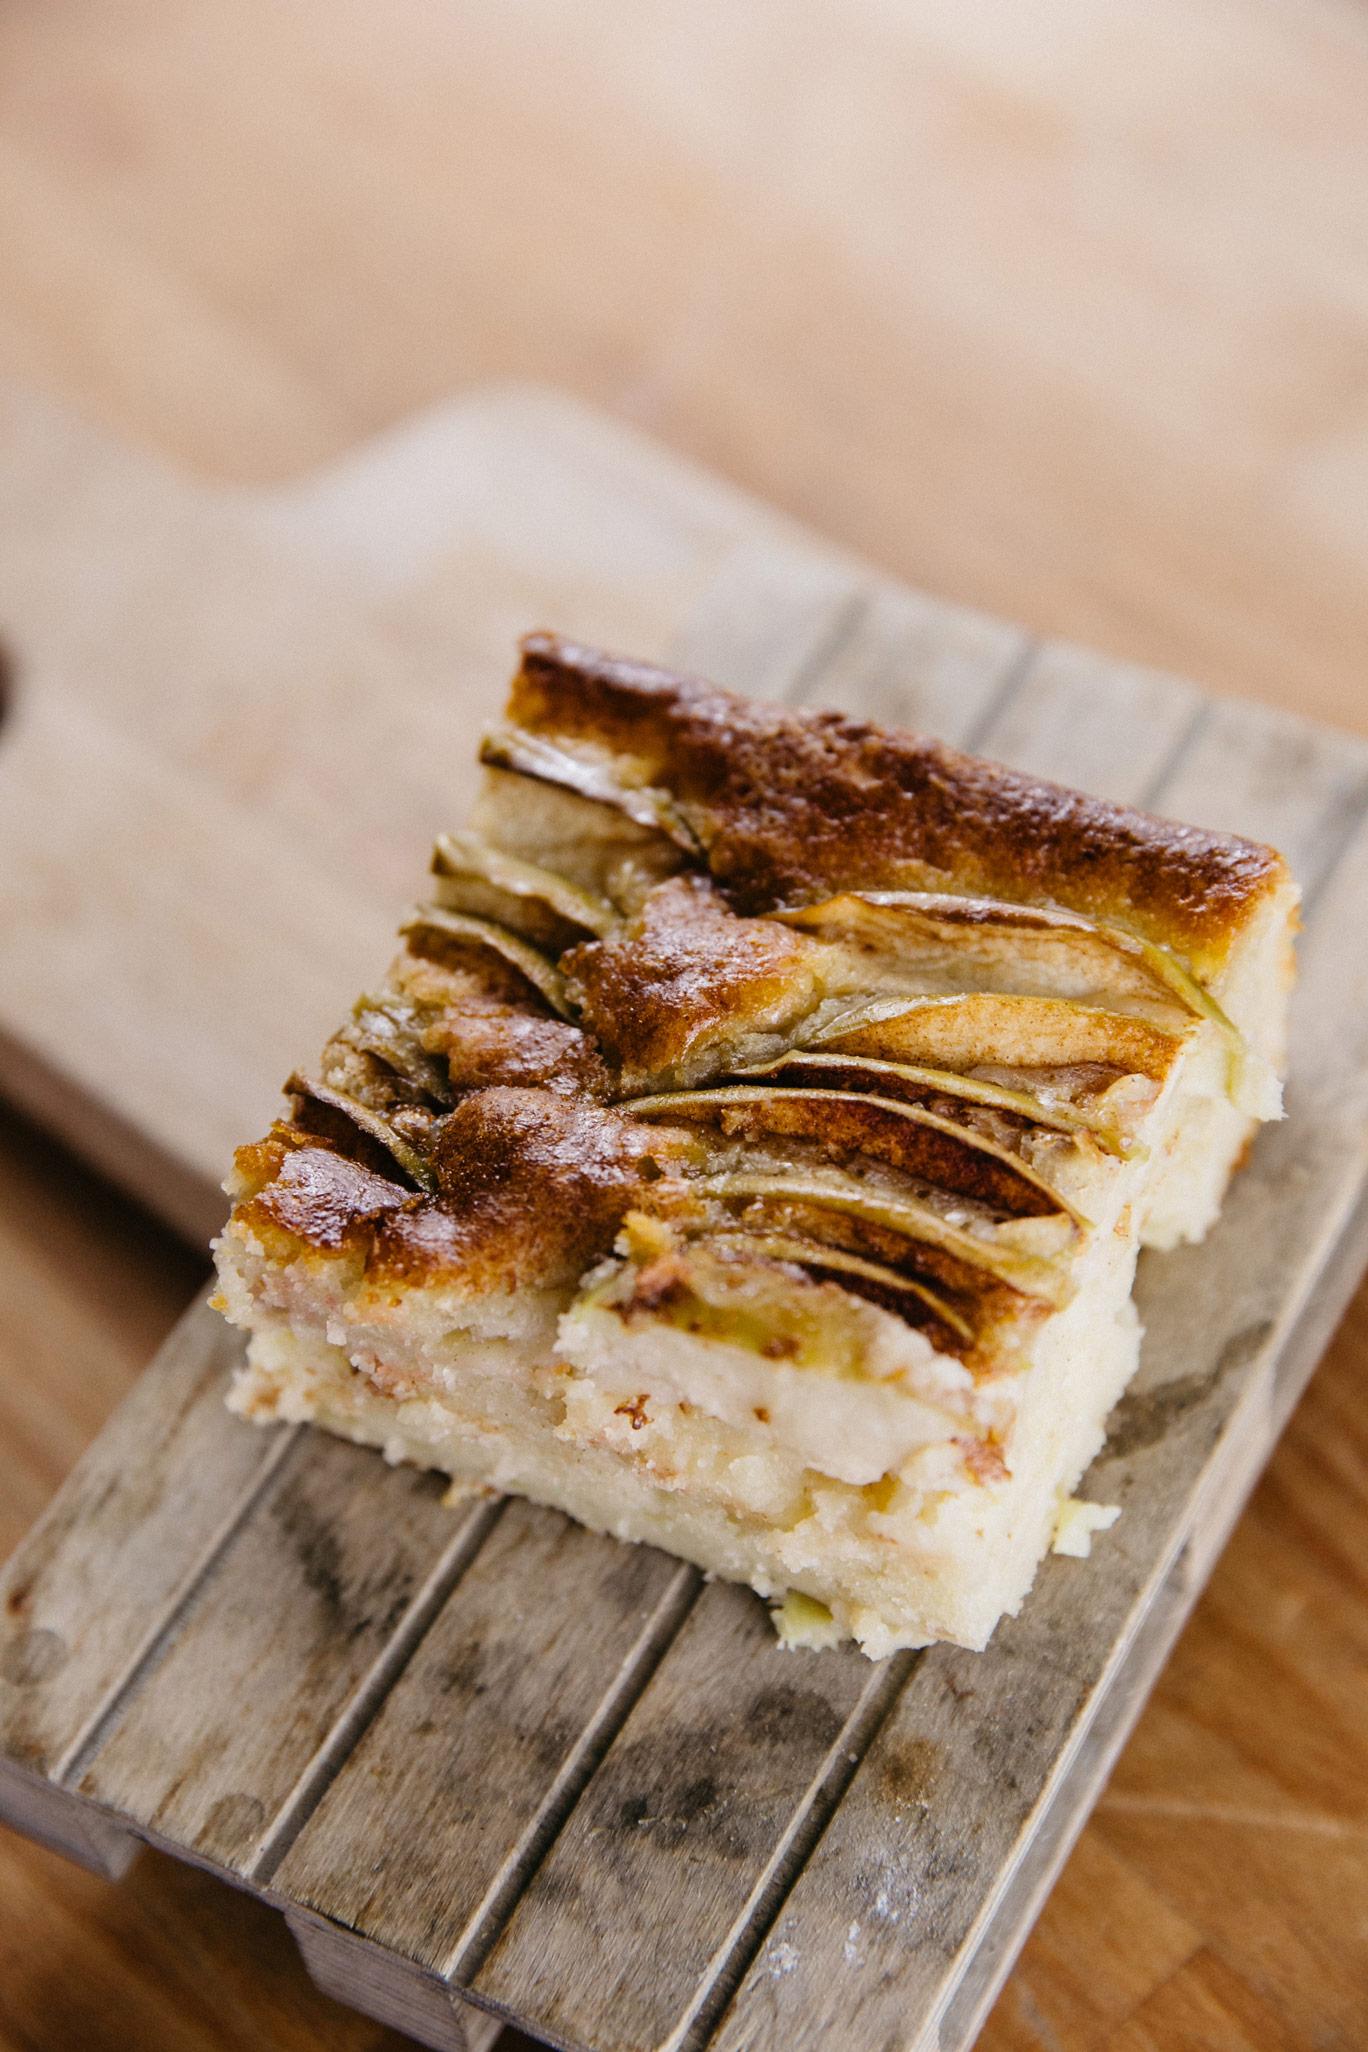 Juicy apple walnut cake